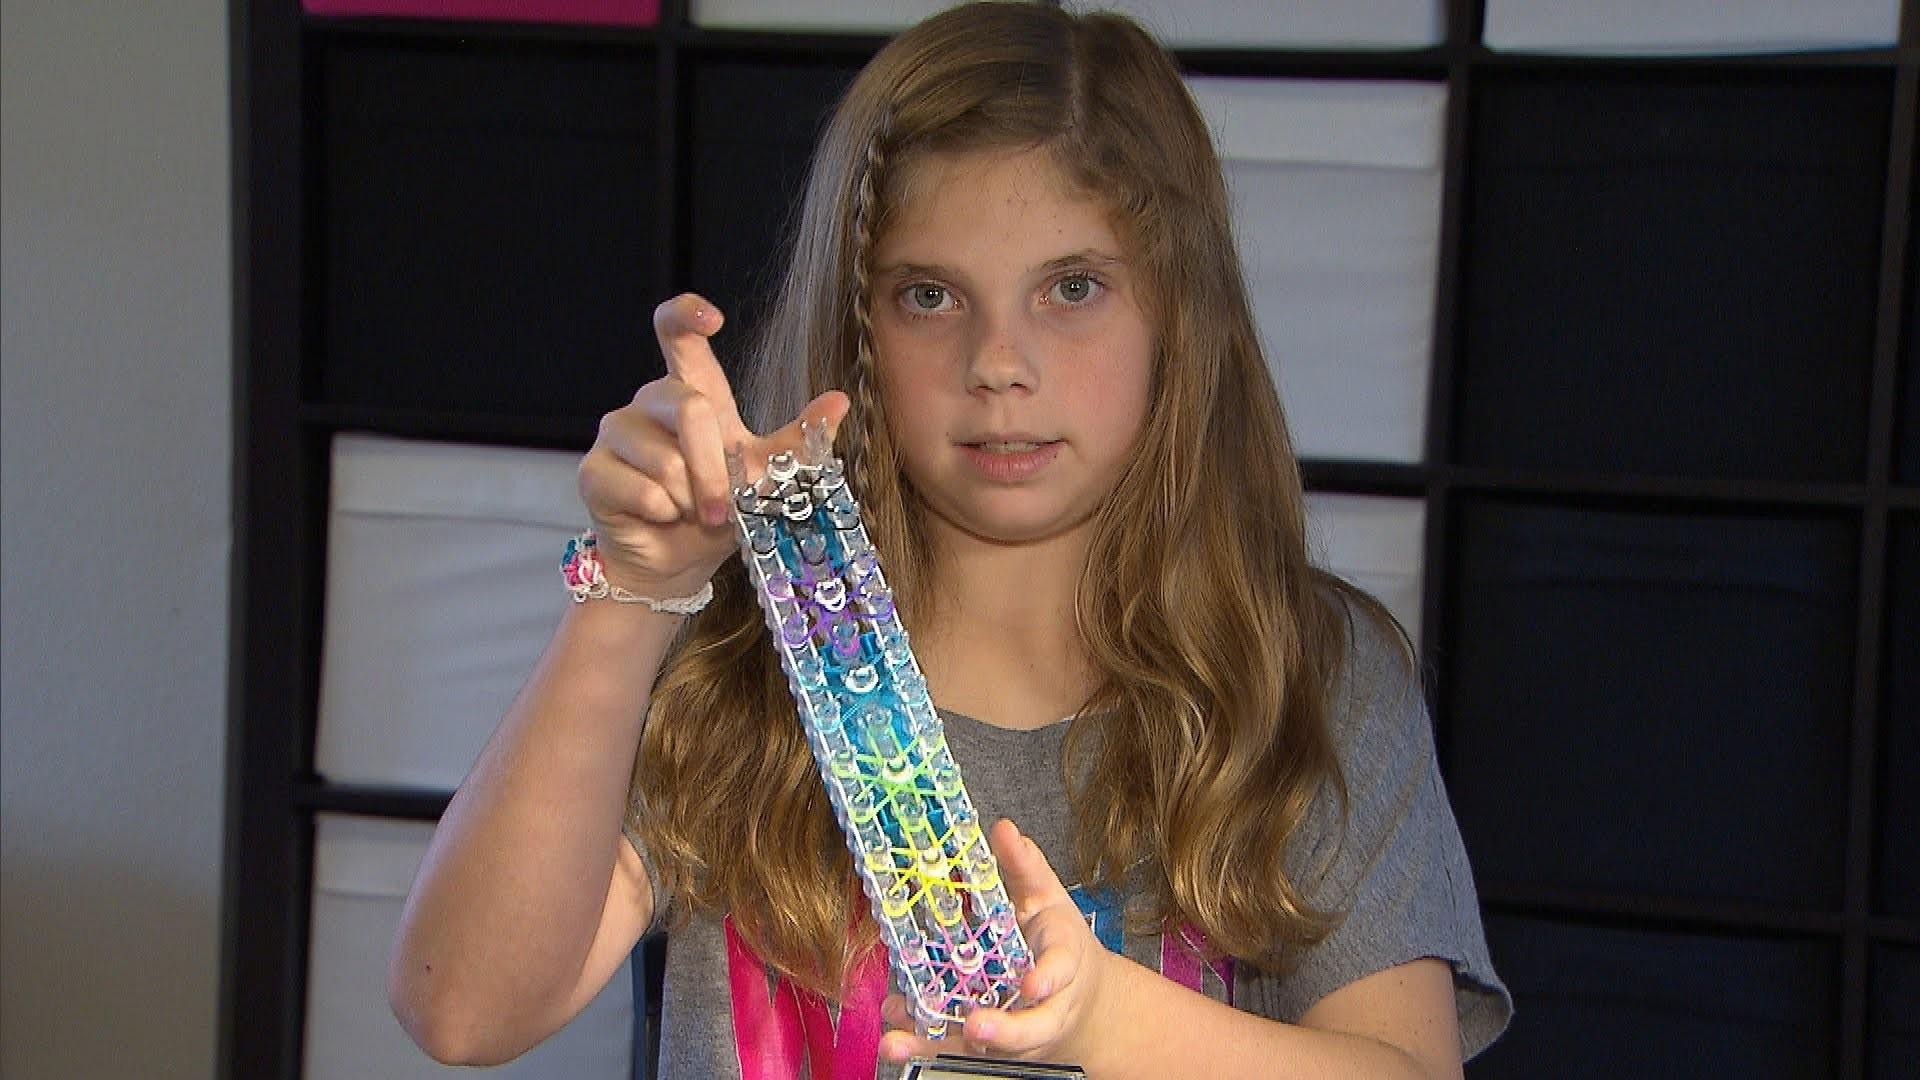 How To Make a Rainbow Loom Starburst Bracelet by Jillian